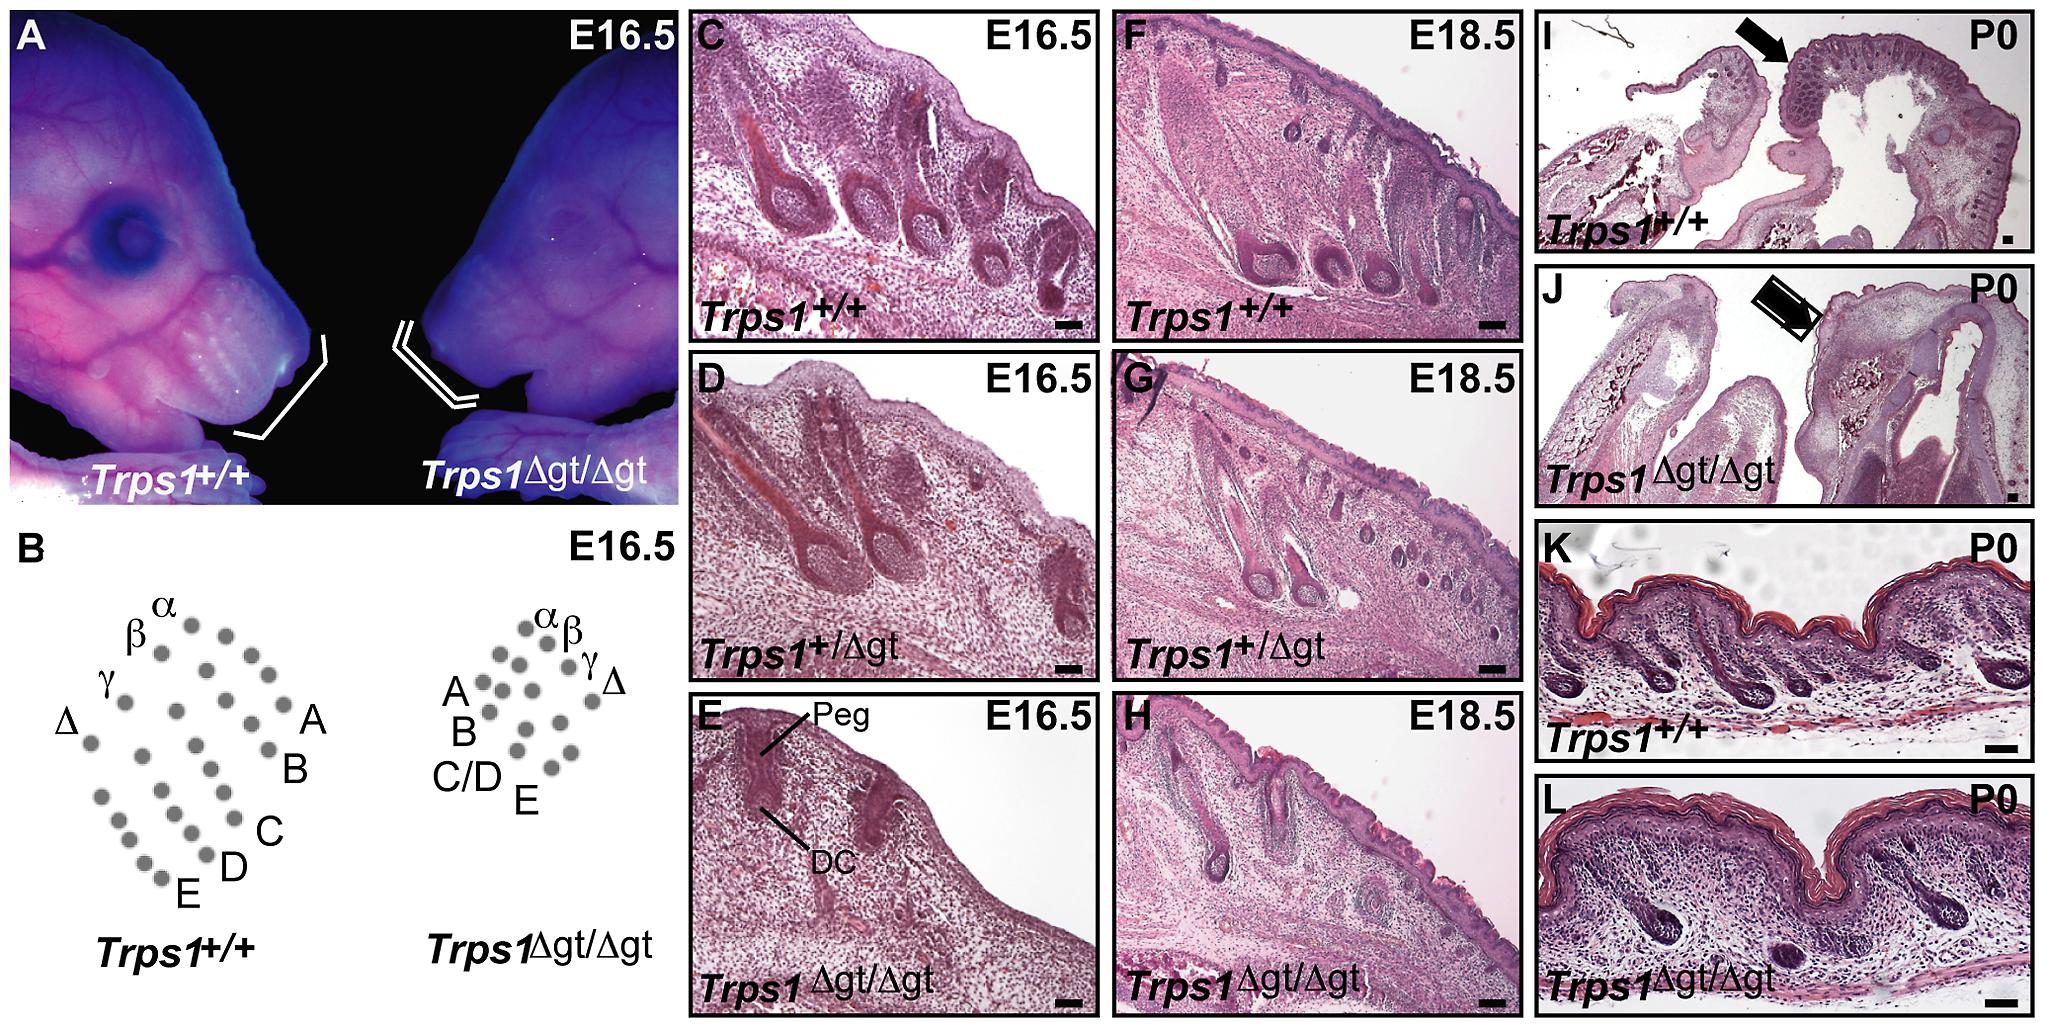 Late morphogenesis vibrissa follicle abnormalities in <i>Trps1<sup>Δgt/Δgt</sup></i> embryos.